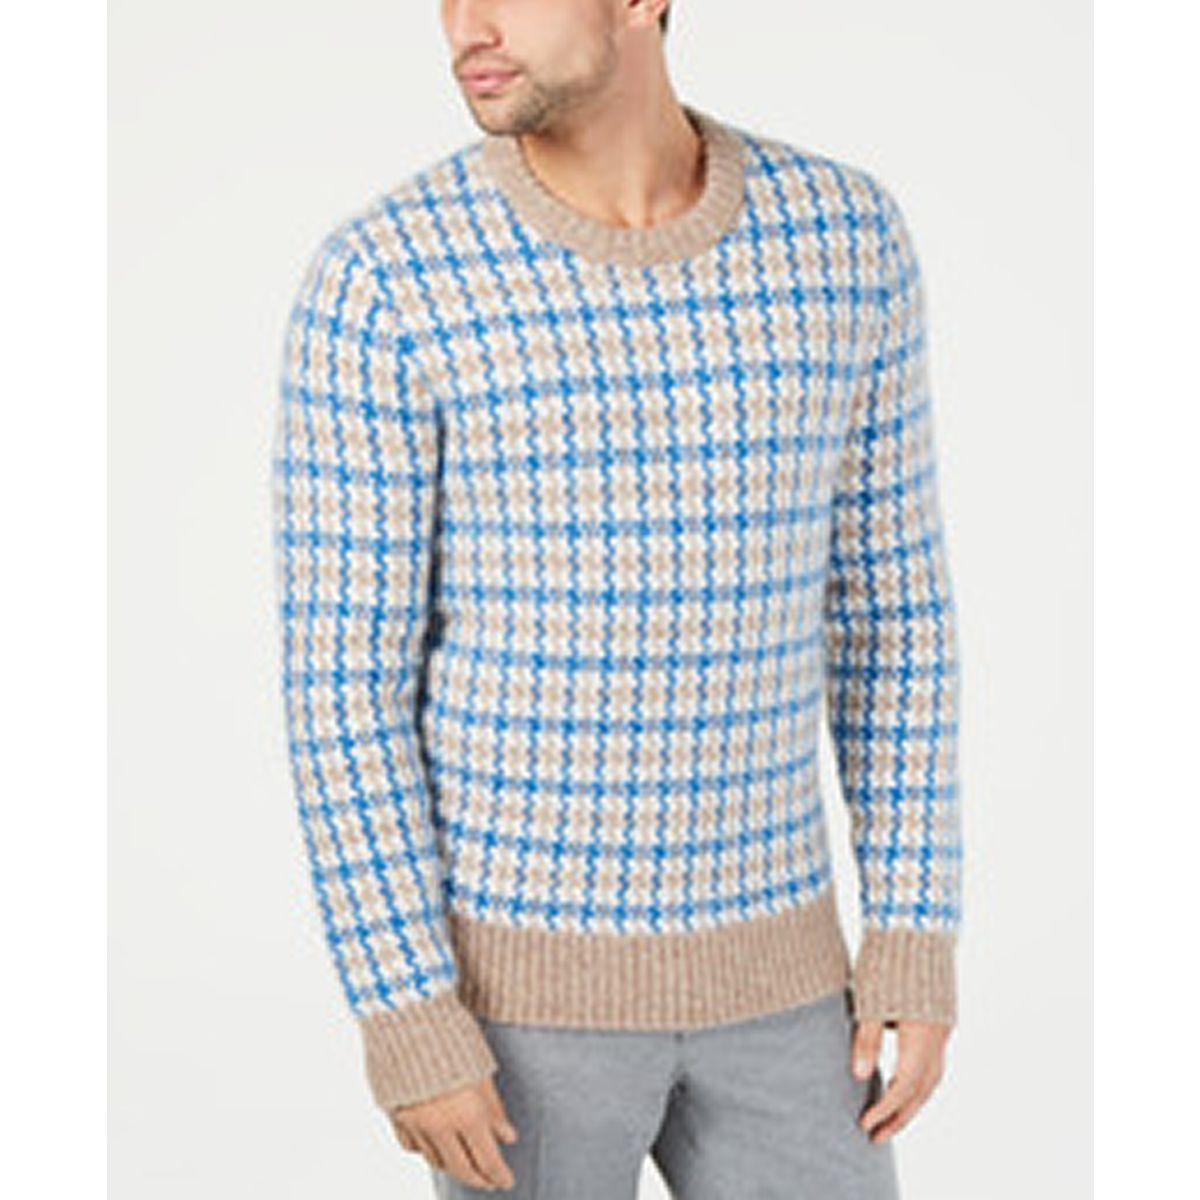 988255cc9b34 Michael Kors Men s Clothing - Macy s